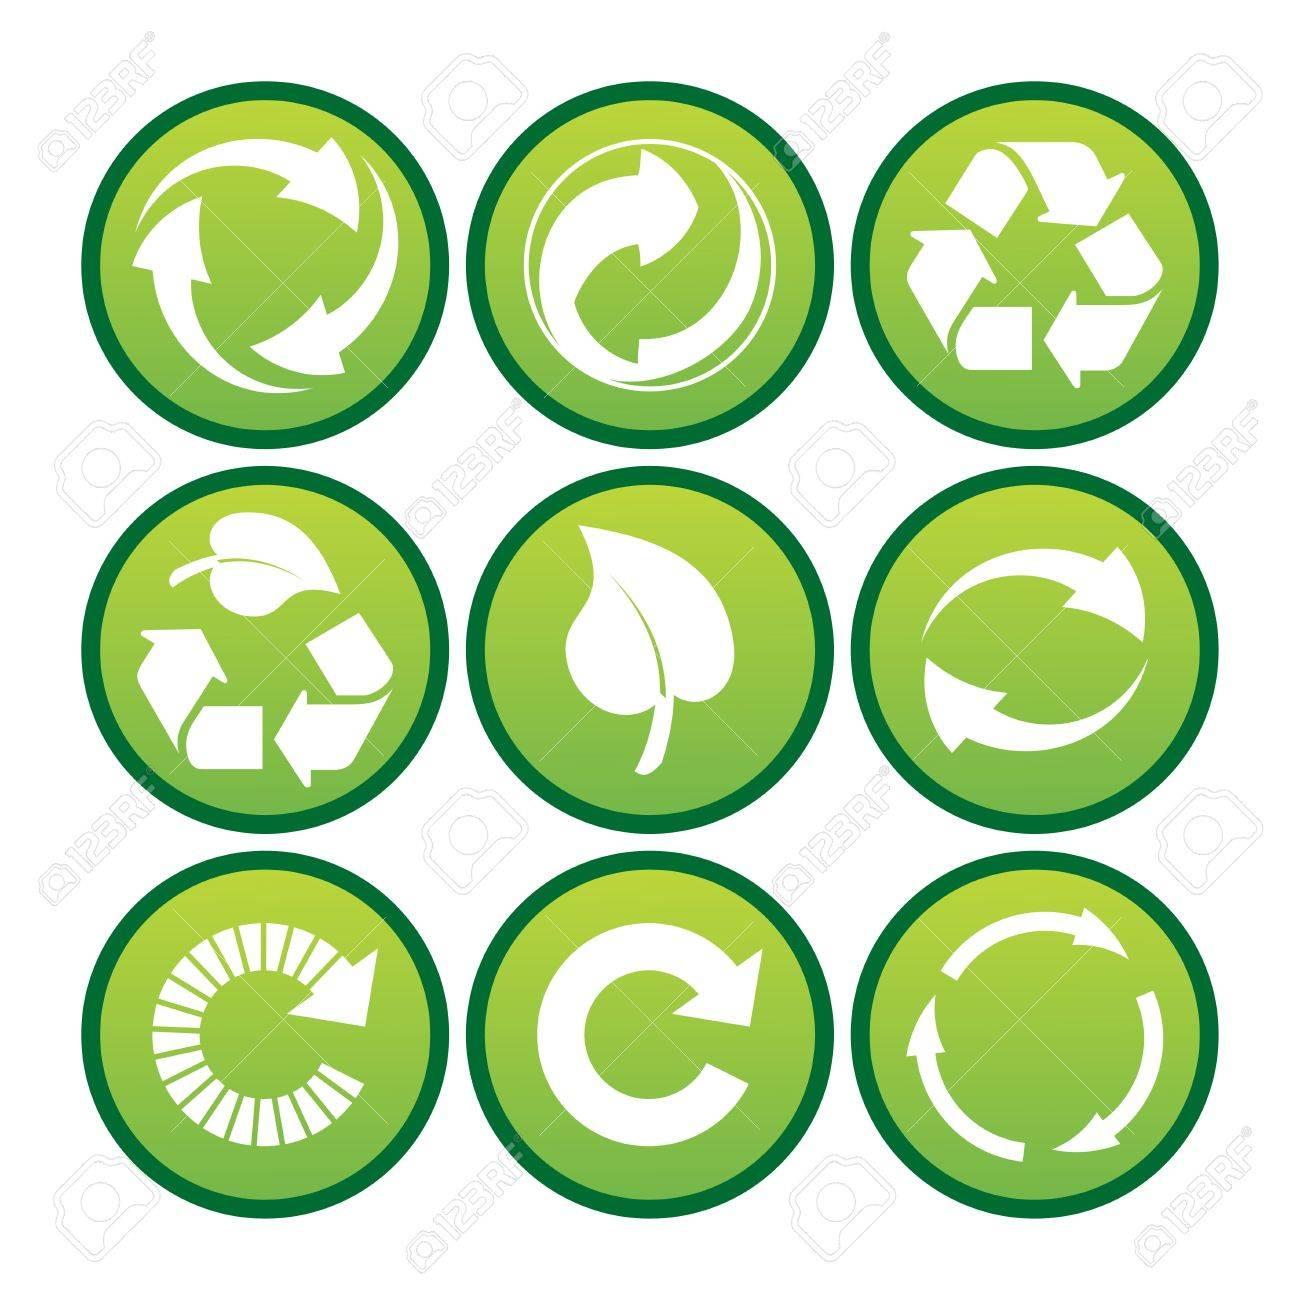 Vector set of environmental / recycling icons Stock Photo - 4394632